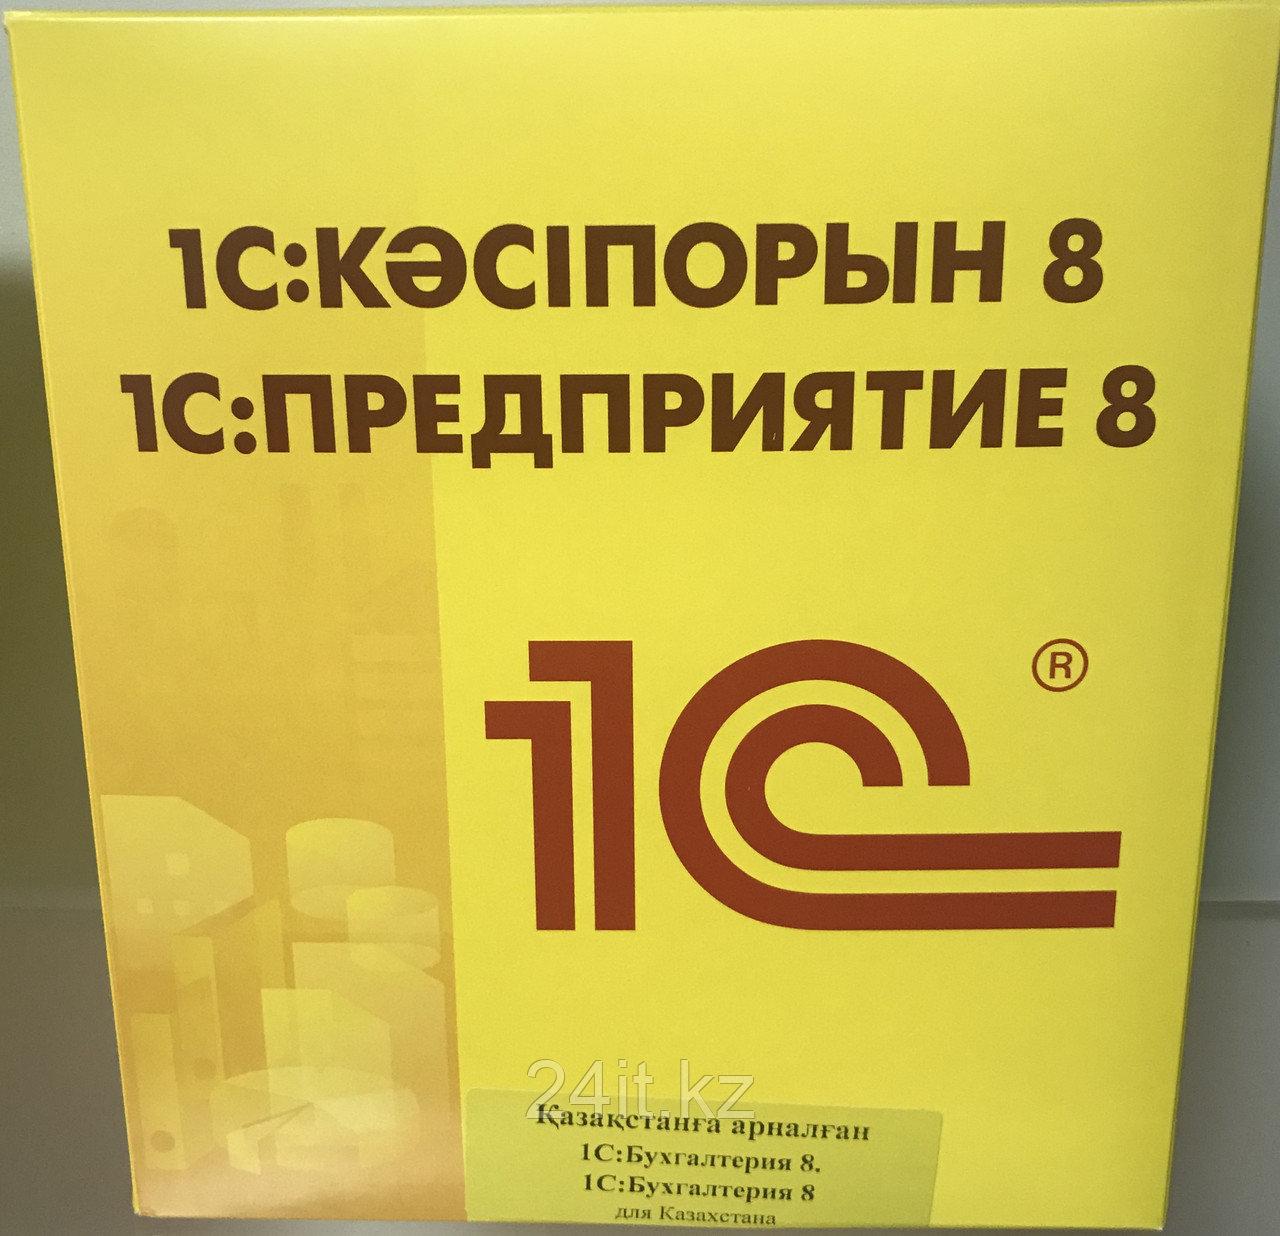 1C:Предприятие Бухгалтерия 8 для Казахстана